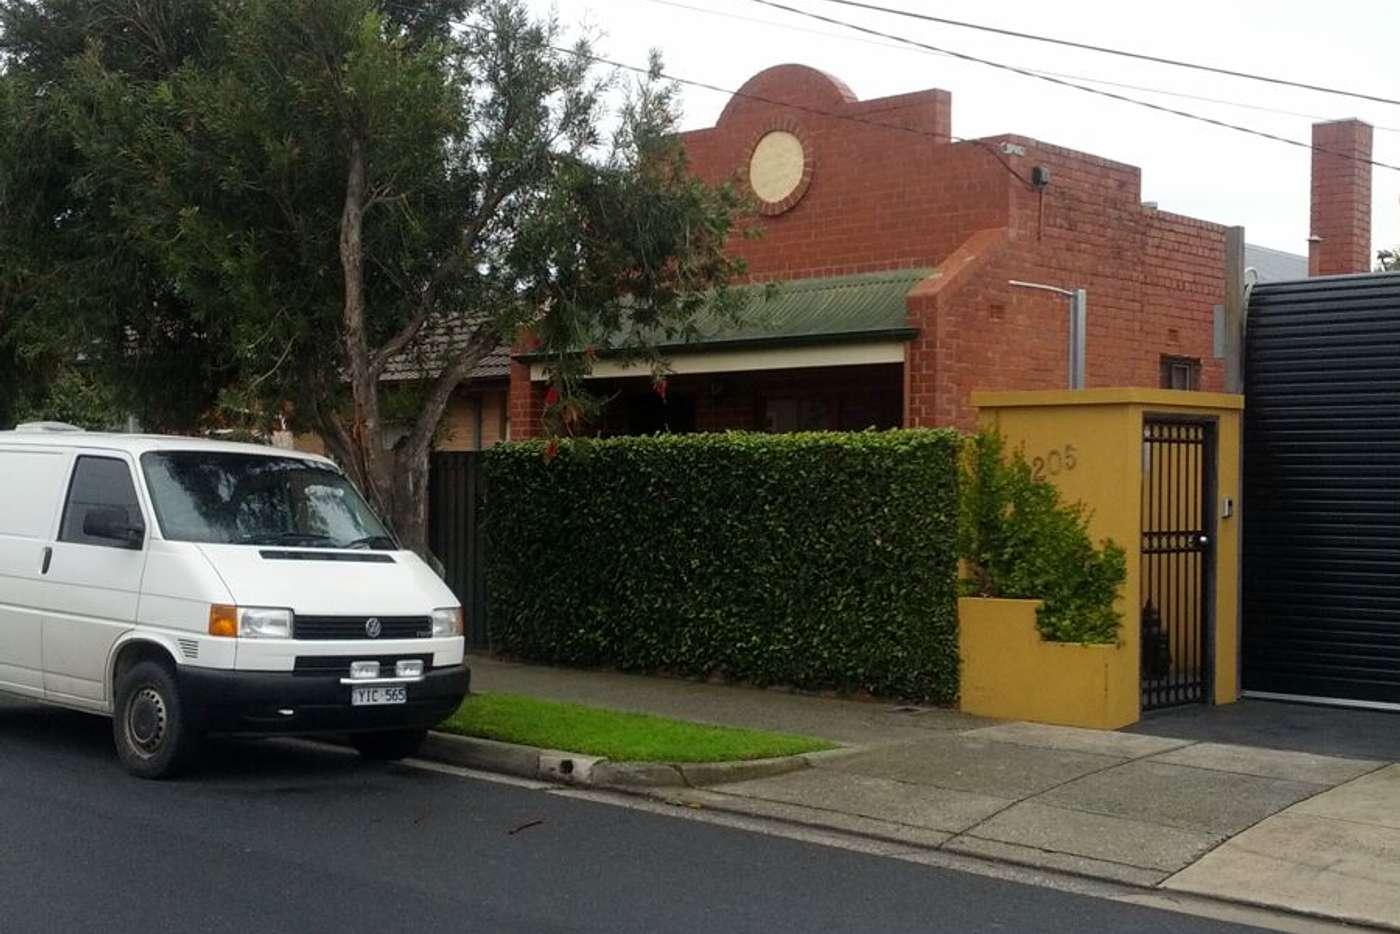 Main view of Homely house listing, 203 Reynard Street, Coburg VIC 3058